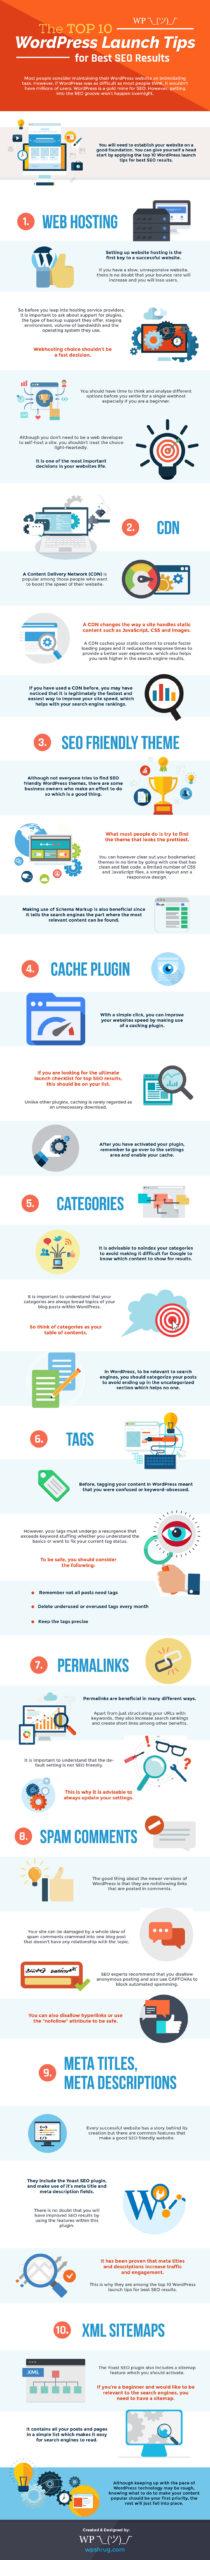 infographie-wordpress-conseils